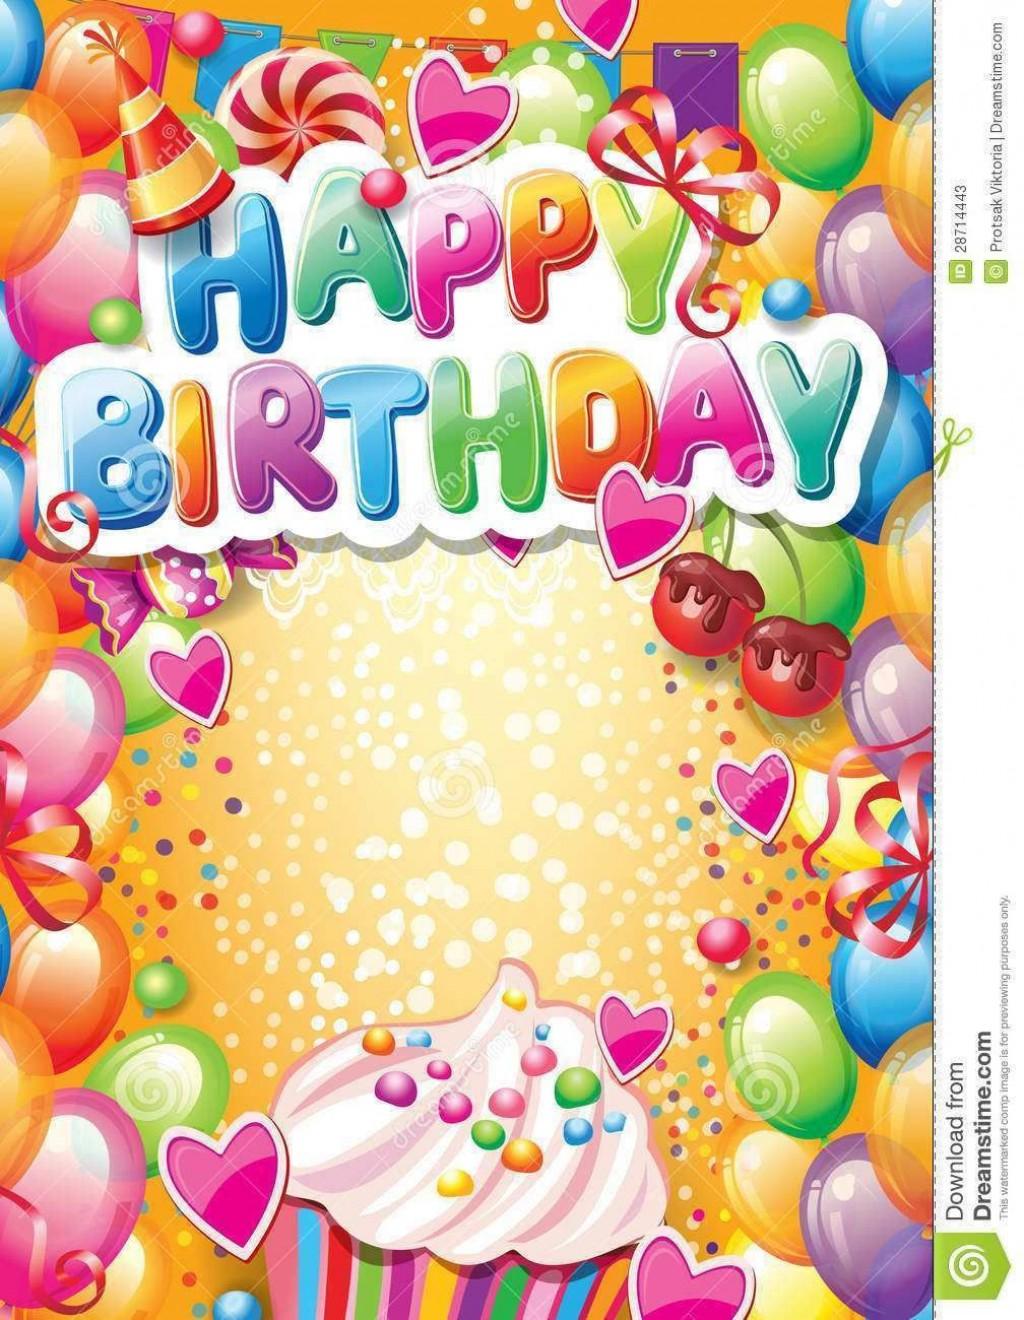 002 Frightening Birthday Card Template Free Image  Invitation Photoshop Download WordLarge